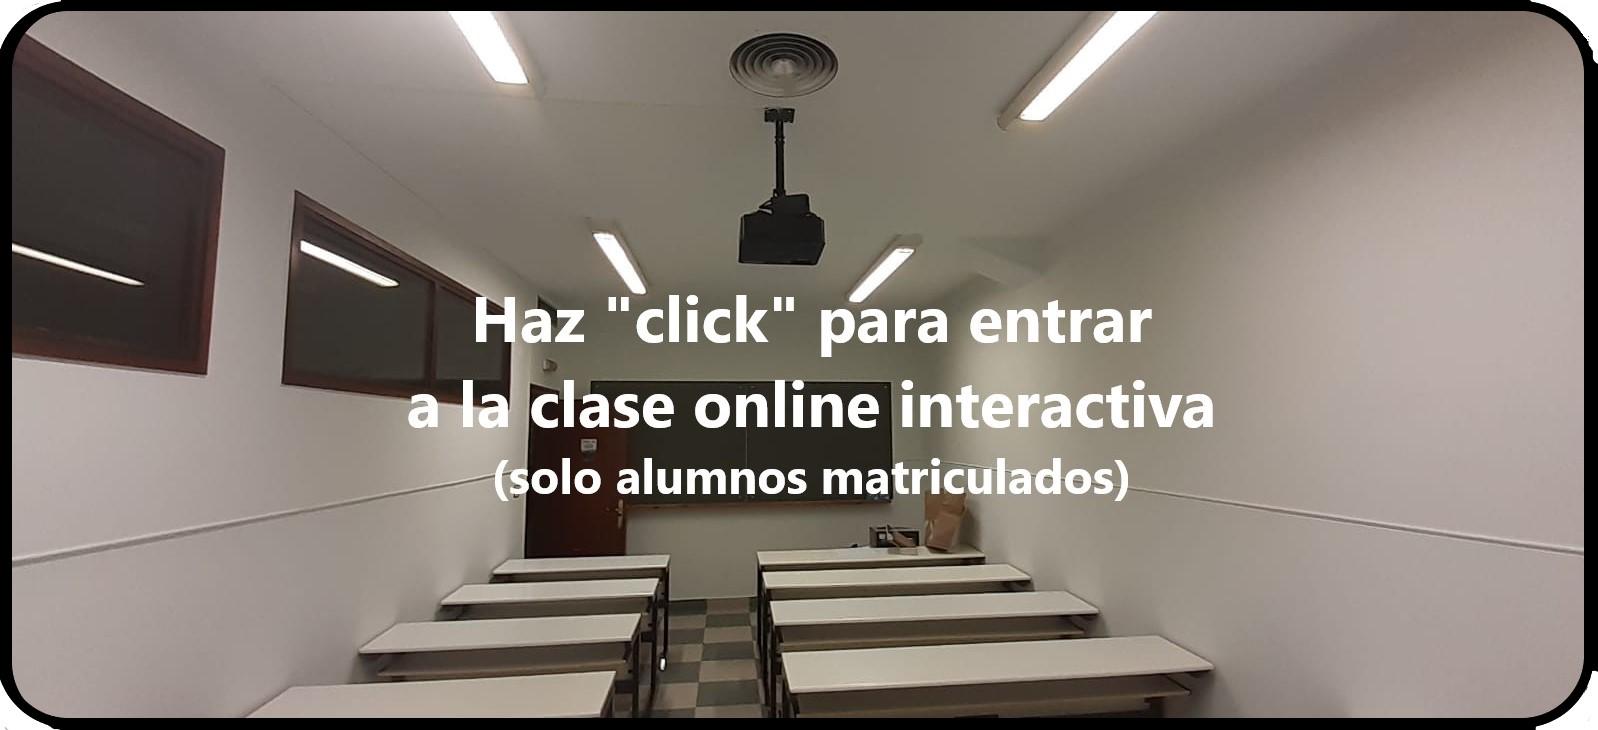 Acceso al aula online interactiva